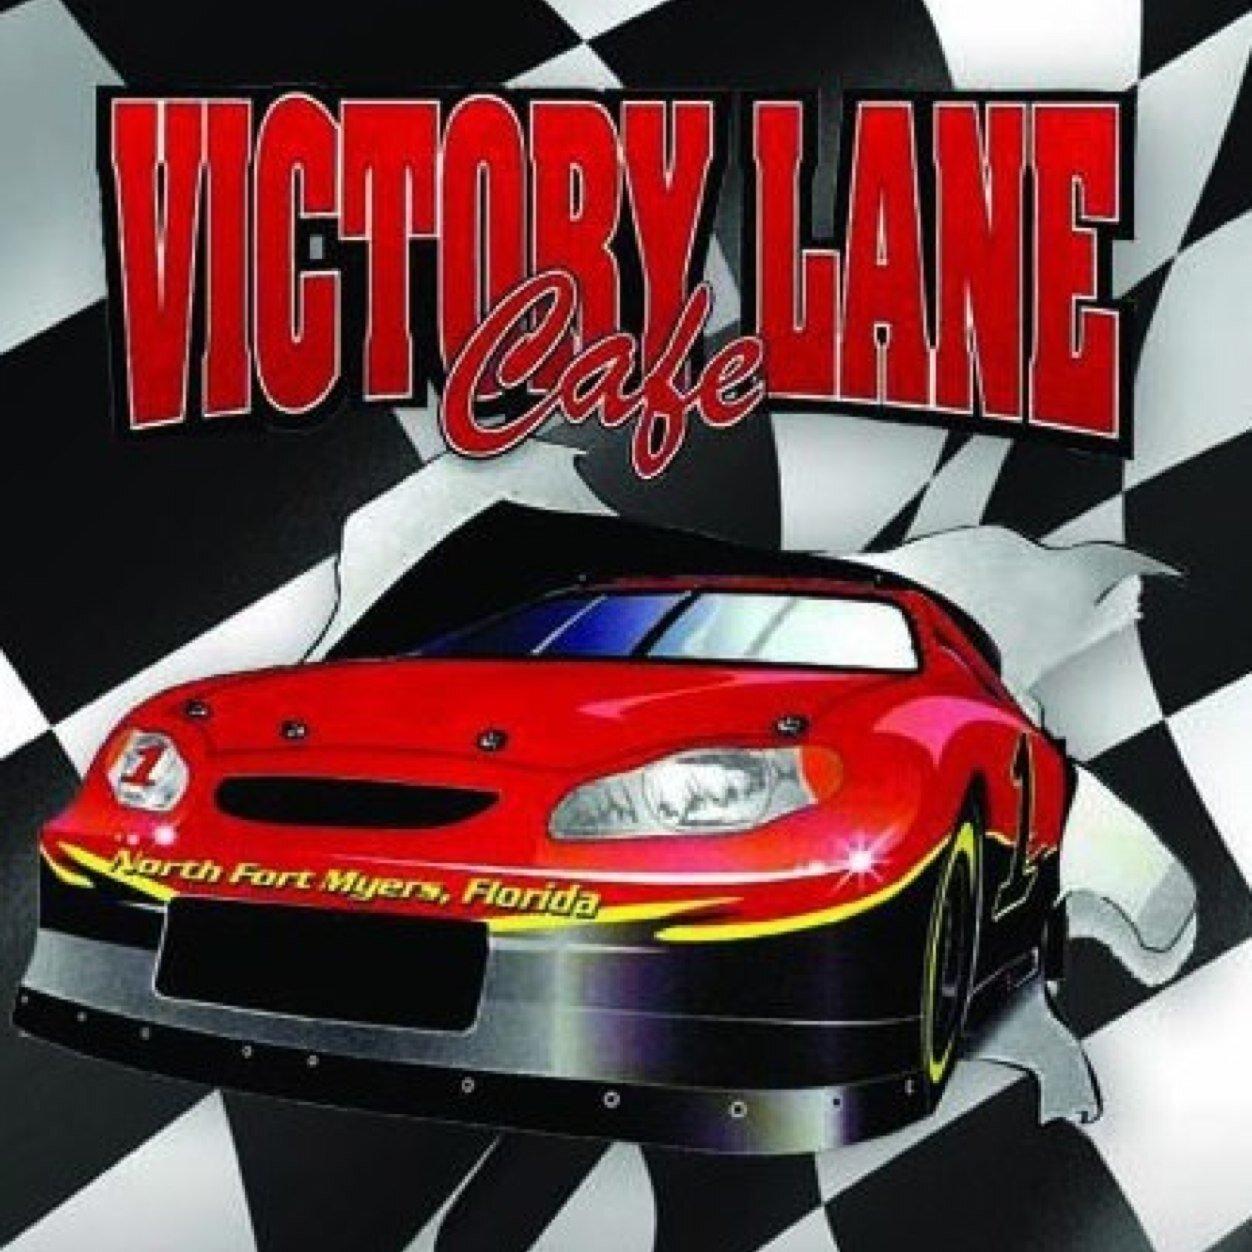 Victory Lane Cafe (@VictoryLaneCafe)   Twitter